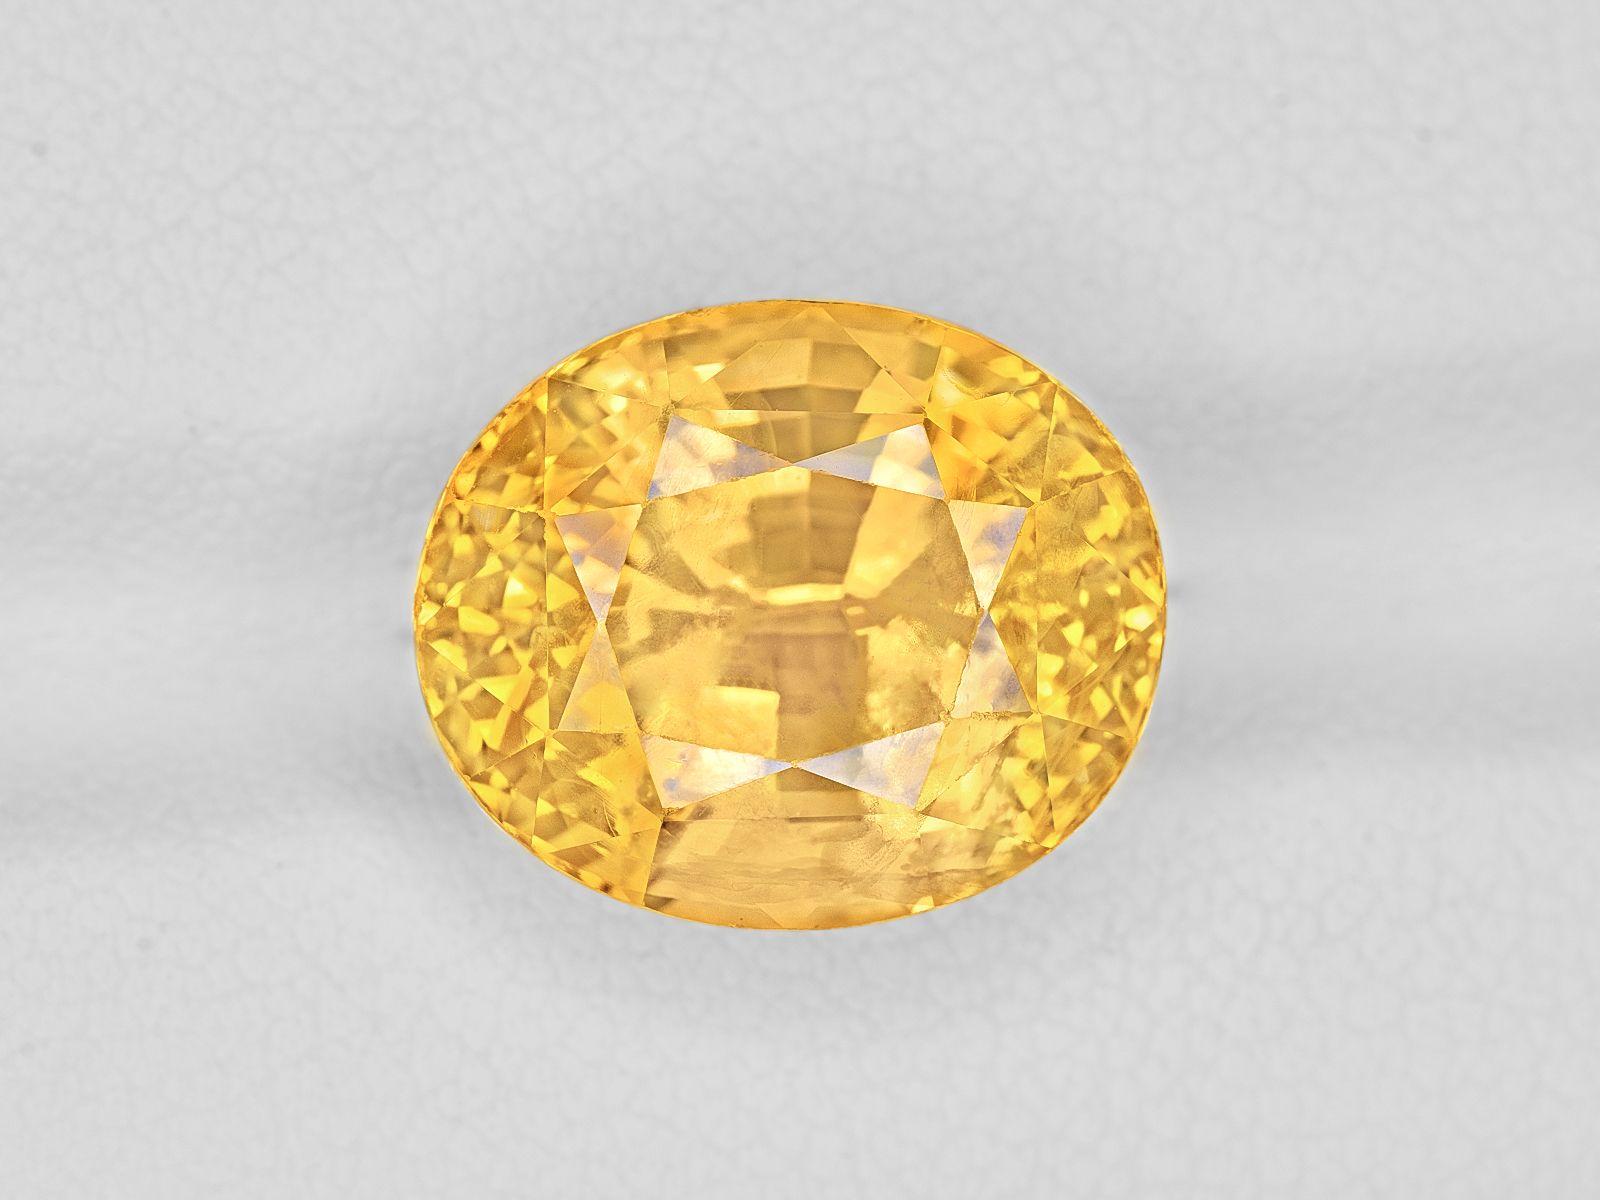 Yellow Sapphire 12 12ct Mined In Sri Lanka Certified By Grs Yellow Sapphire Fancy Sapphire Sapphire Stone